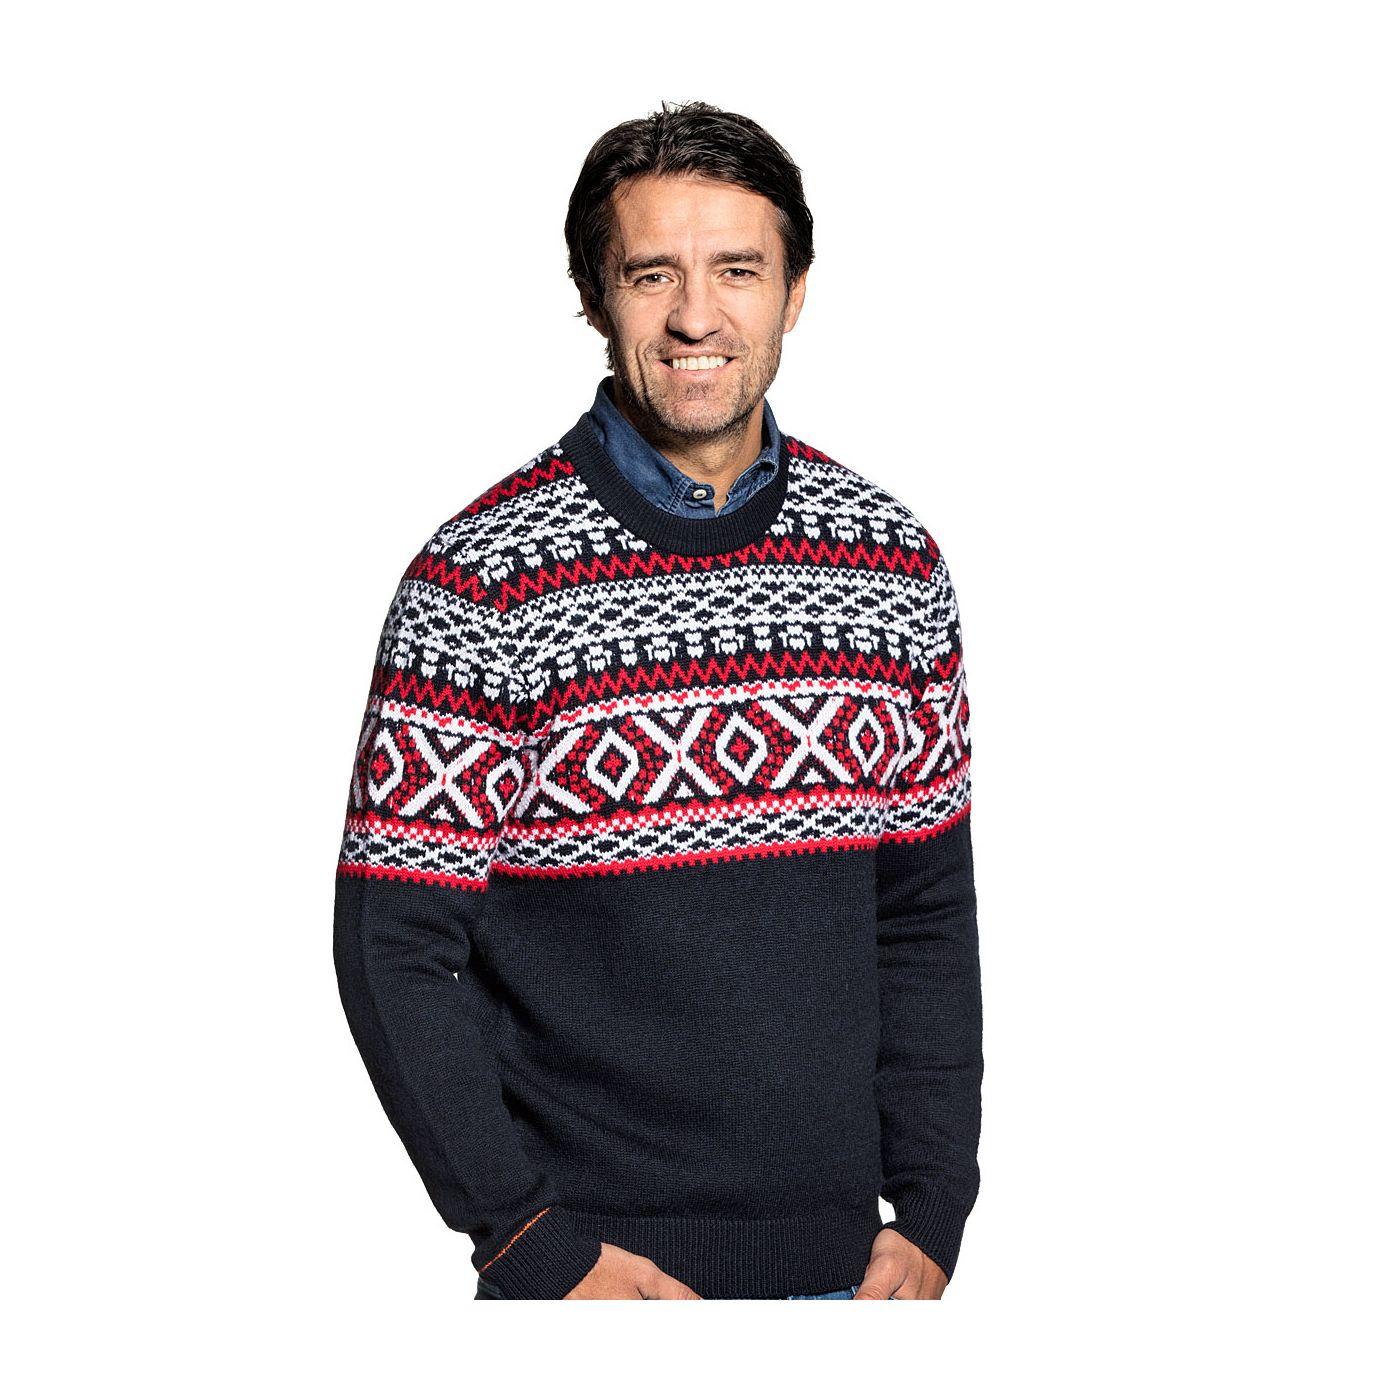 Nordic sweater for men made of Merino wool in Dark blue